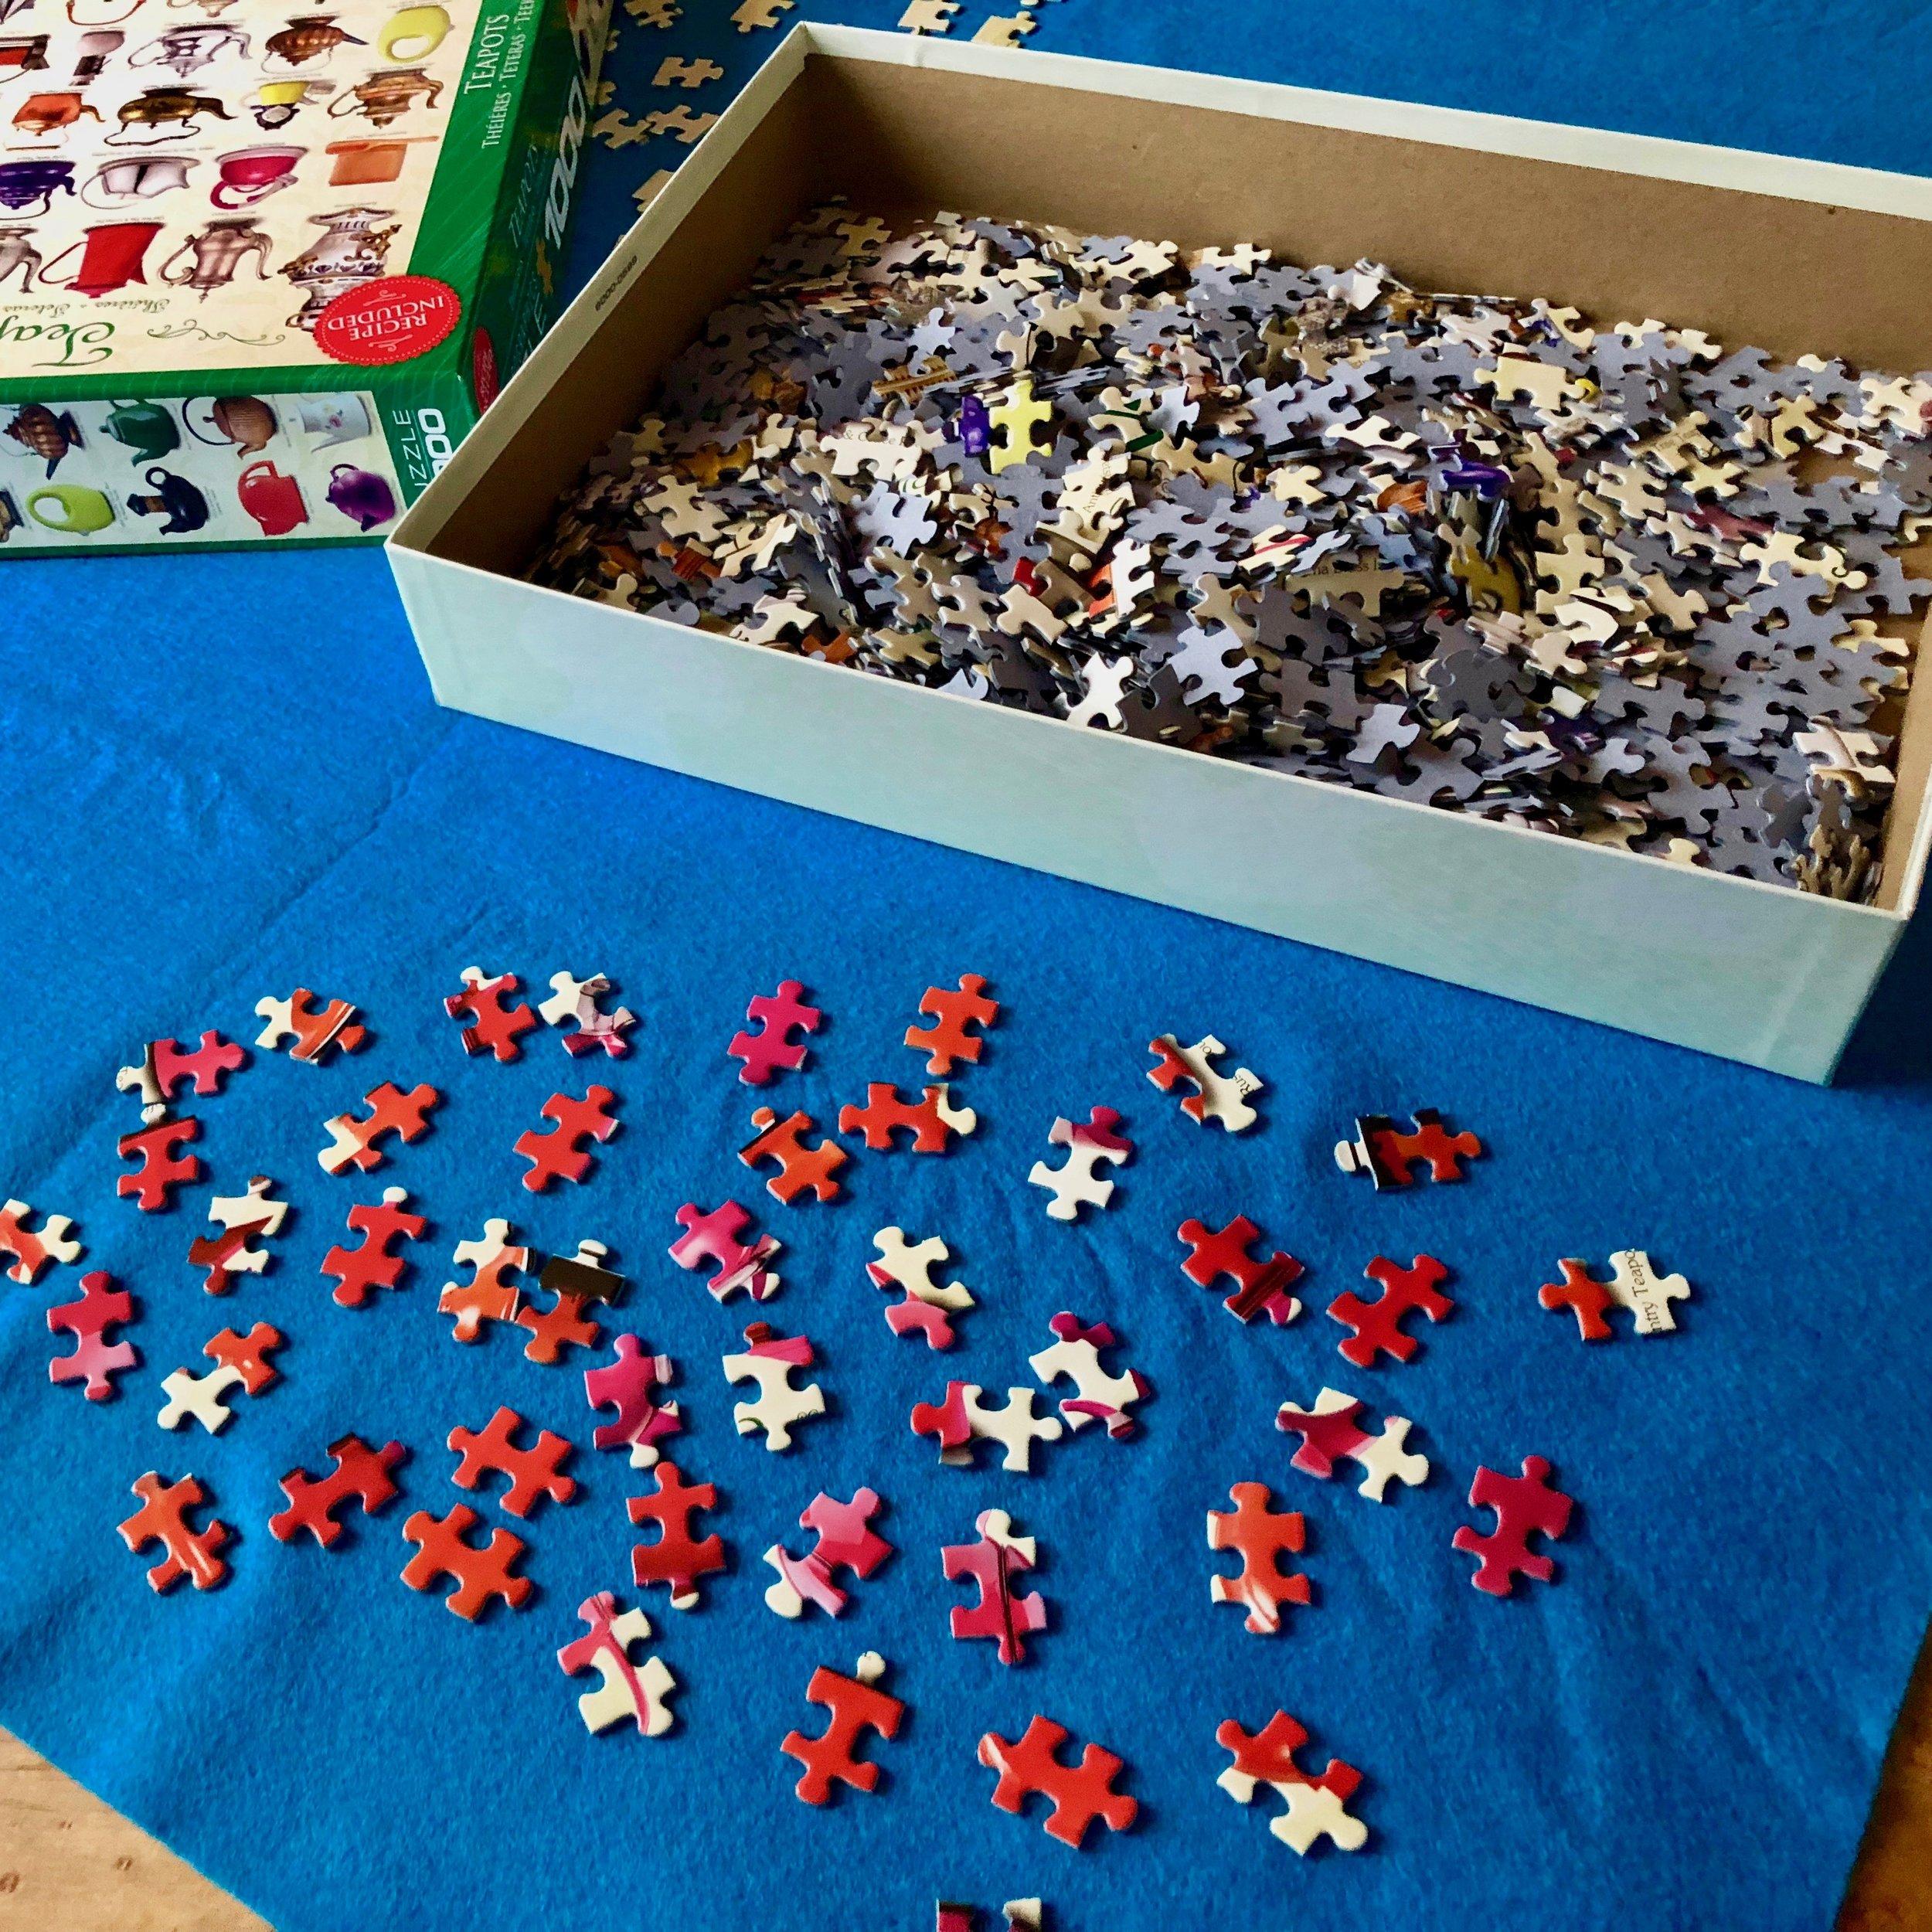 dan-snow-stoneworks-puzzle-post-isosceles-wall - 5.jpg